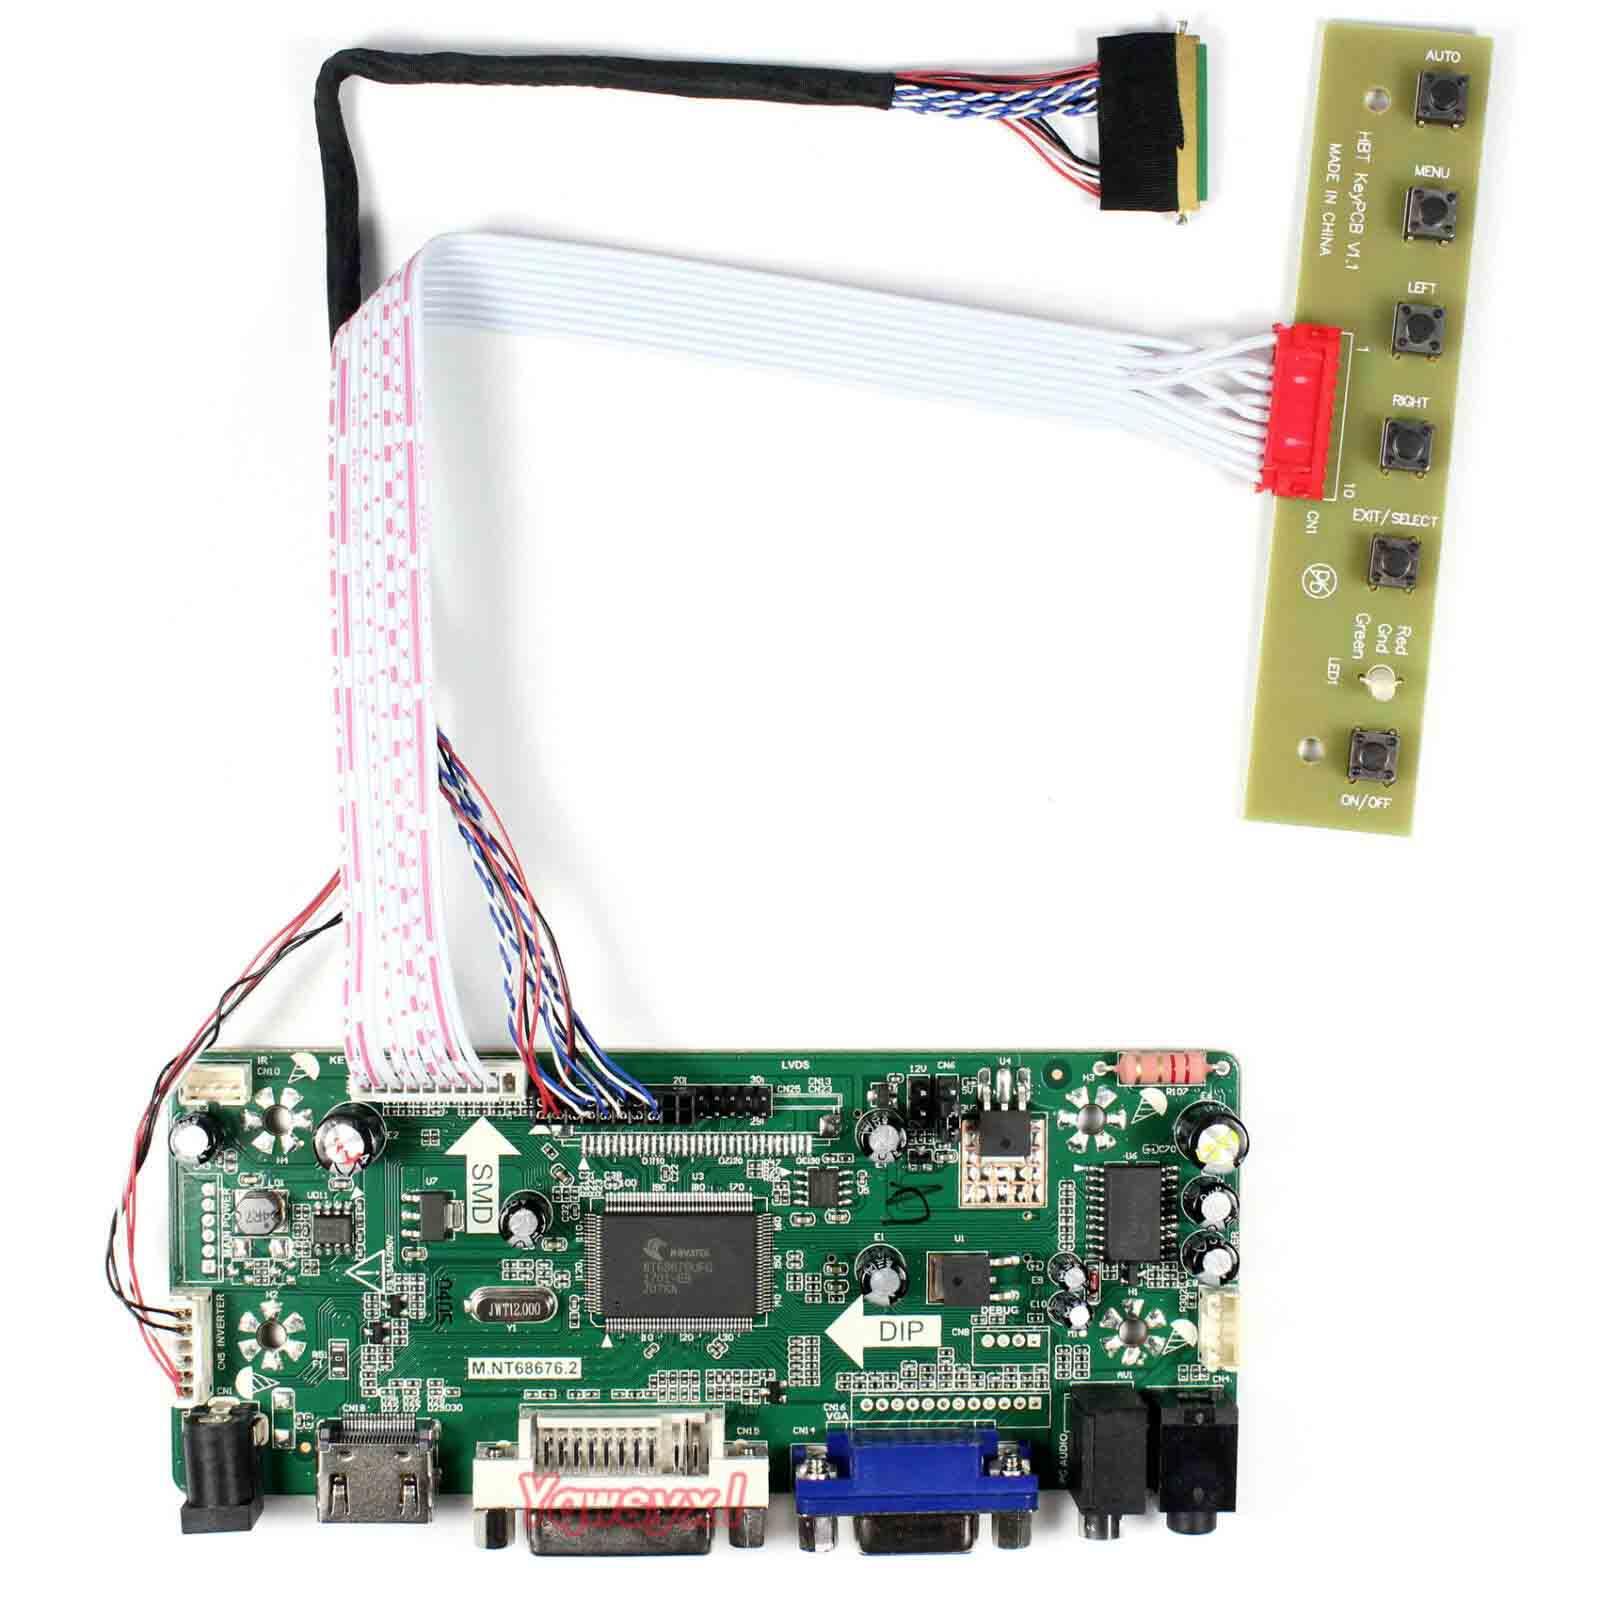 Kit de Monitor de placa de Control Yqwsyxl para B173RW01 V4 HDMI + DVI + VGA LCD controlador de pantalla LED